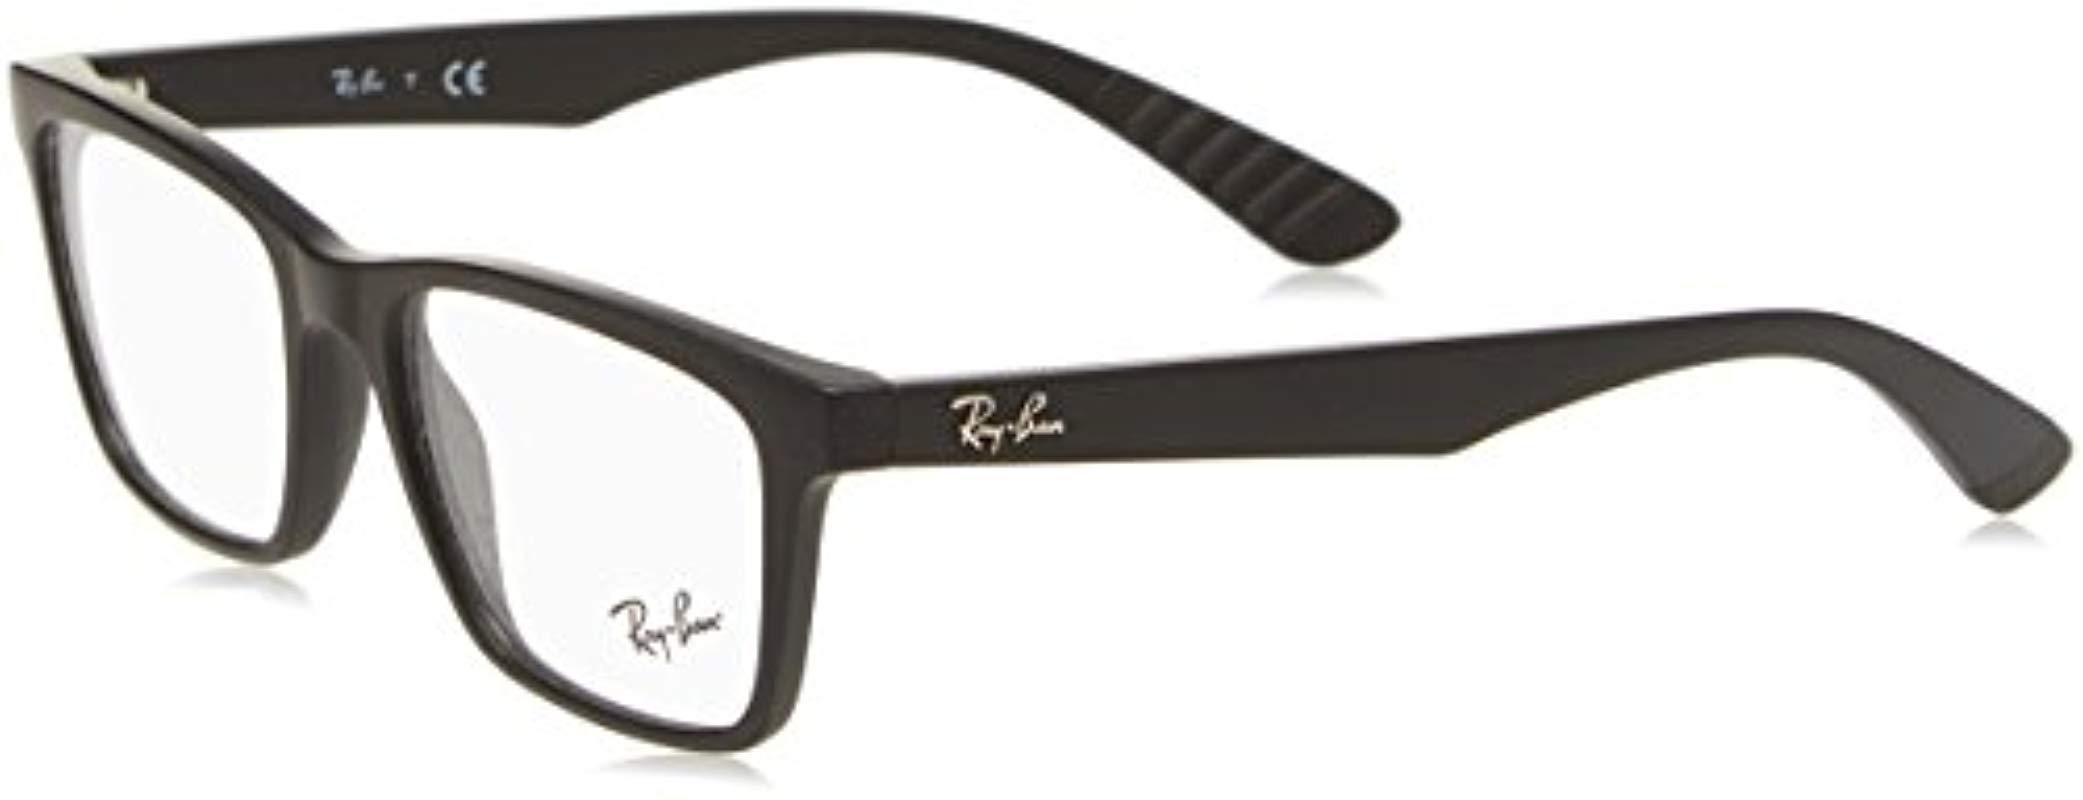 1bb7620503 Ray-Ban 0rx 7025 2077 53 Optical Frames